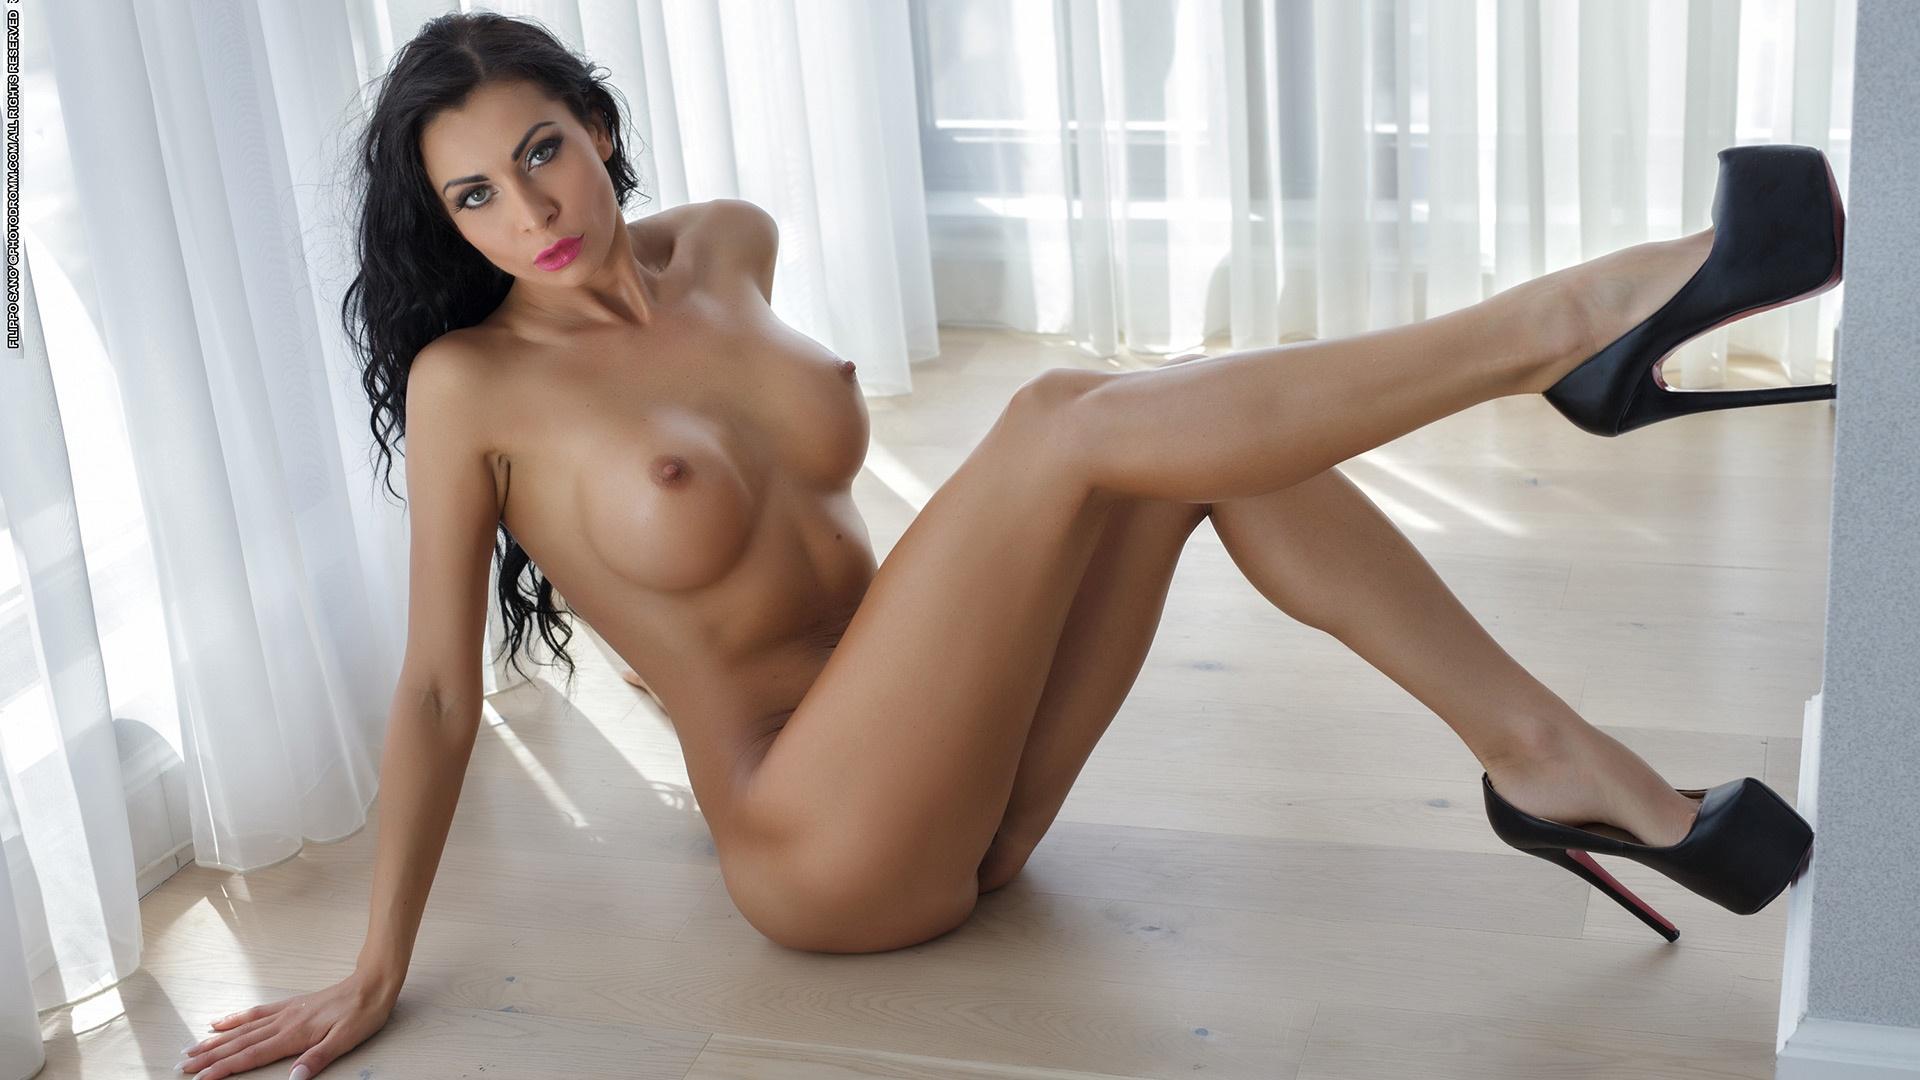 Nude chuby mexican girl